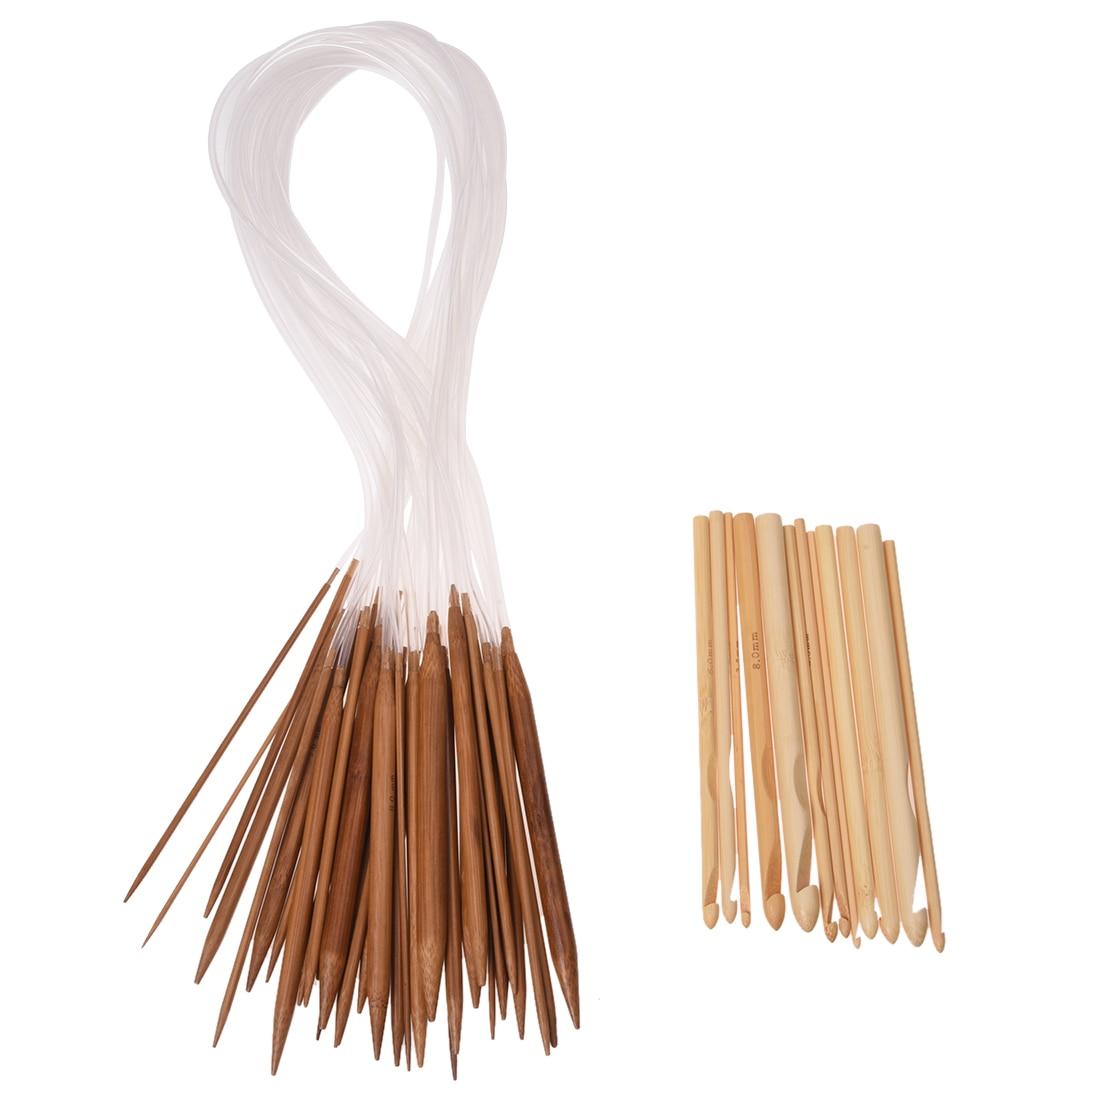 18 Sizes 2.0mm-10.0mm 80 cm Circular Needles and 12 Sizes 3,0-10mm Bamboo Crochet Hook Knitting Needles